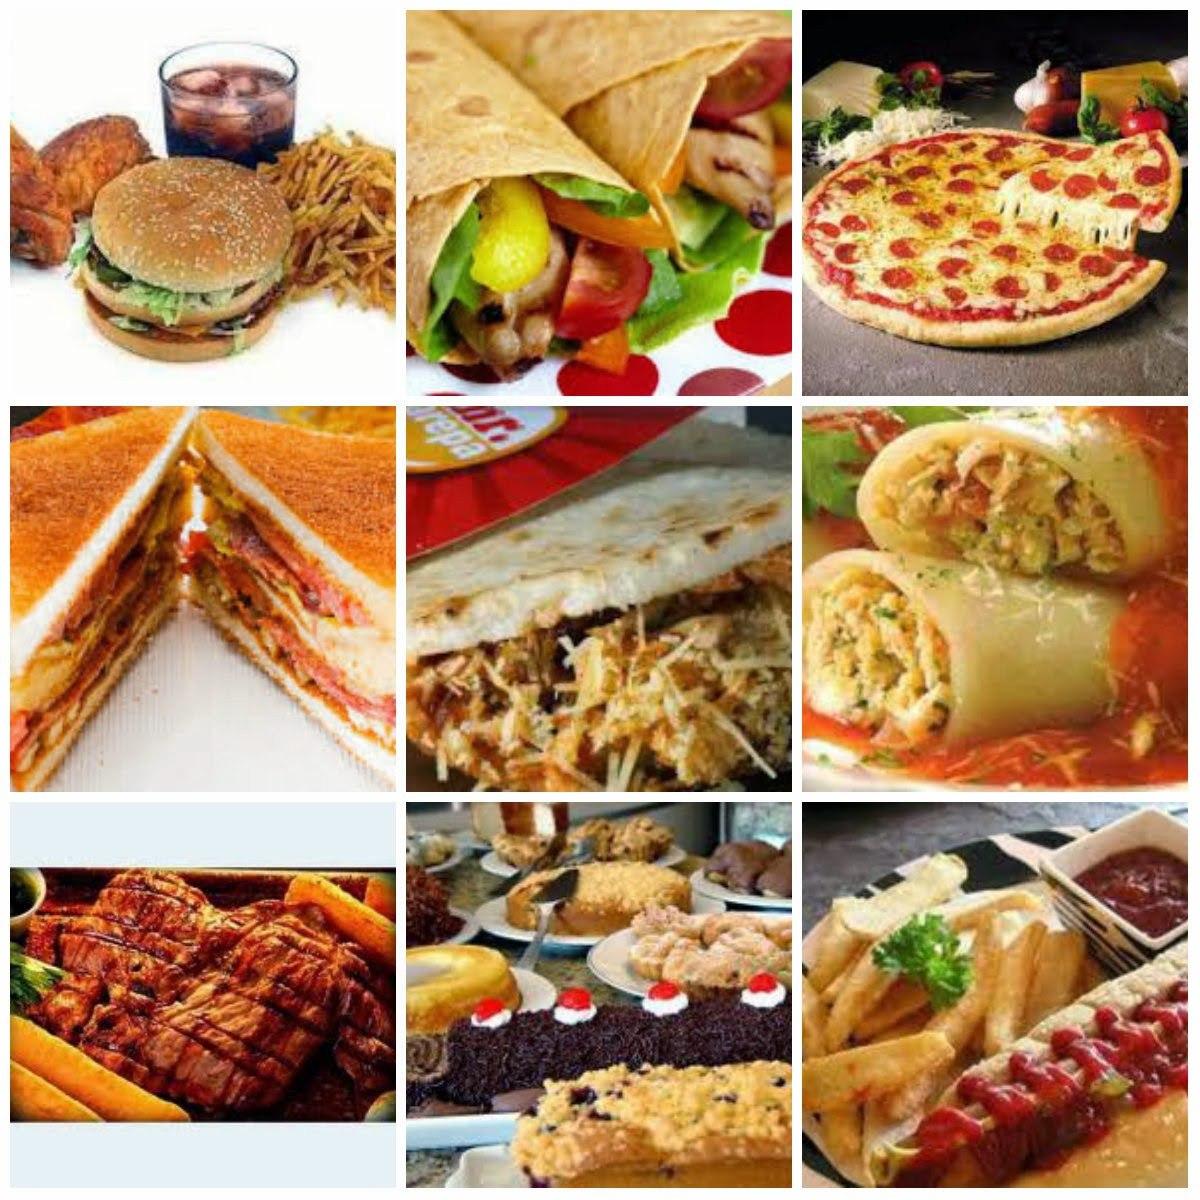 Proveedores comidas rapidas panes salsas carnes papas for Mesas para negocio comidas rapidas